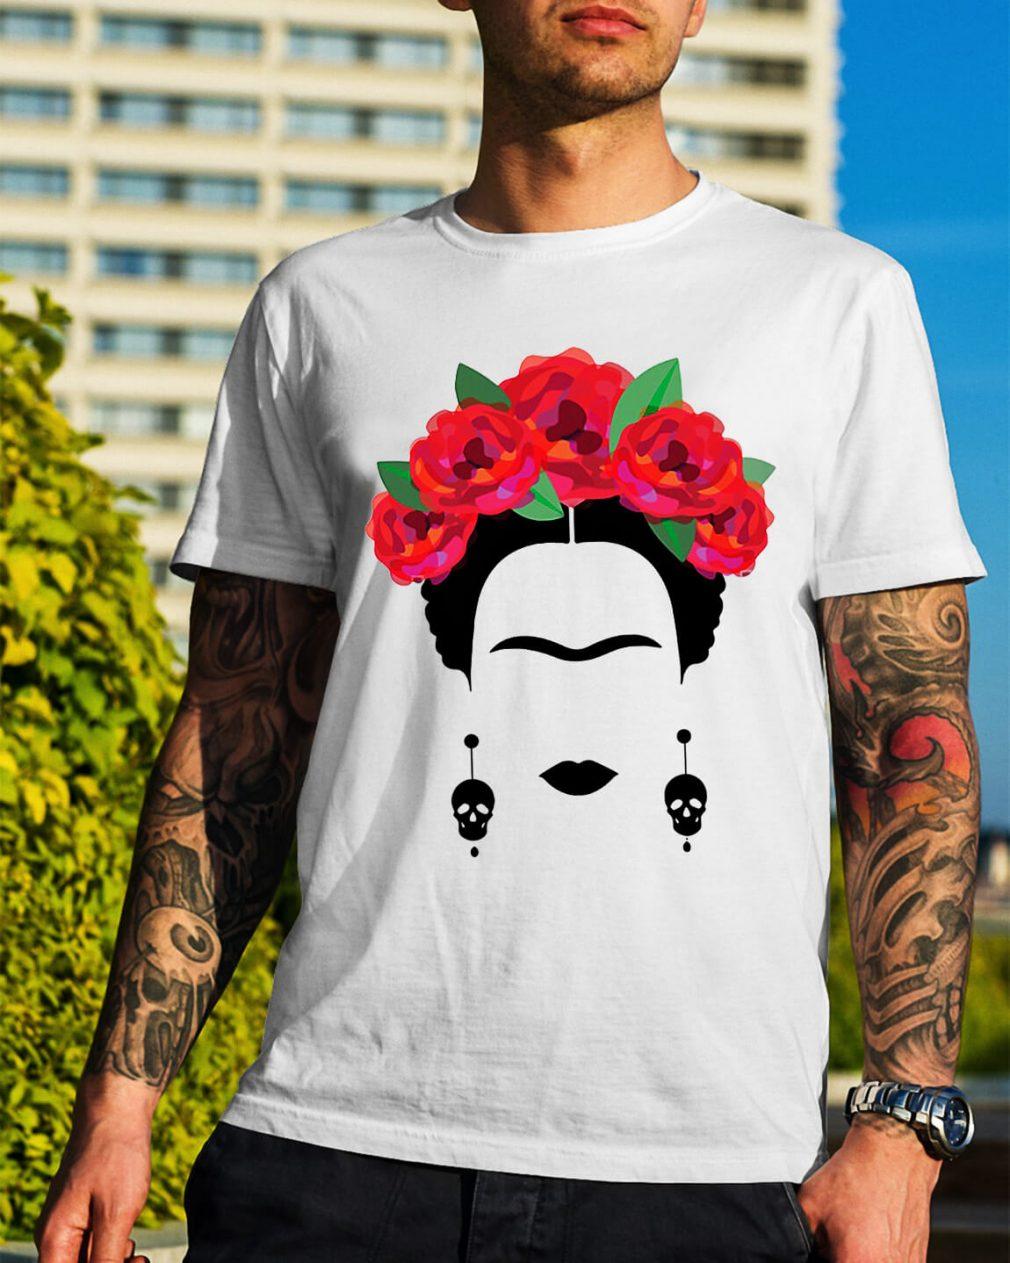 Feminist Frida Kahlo shirt